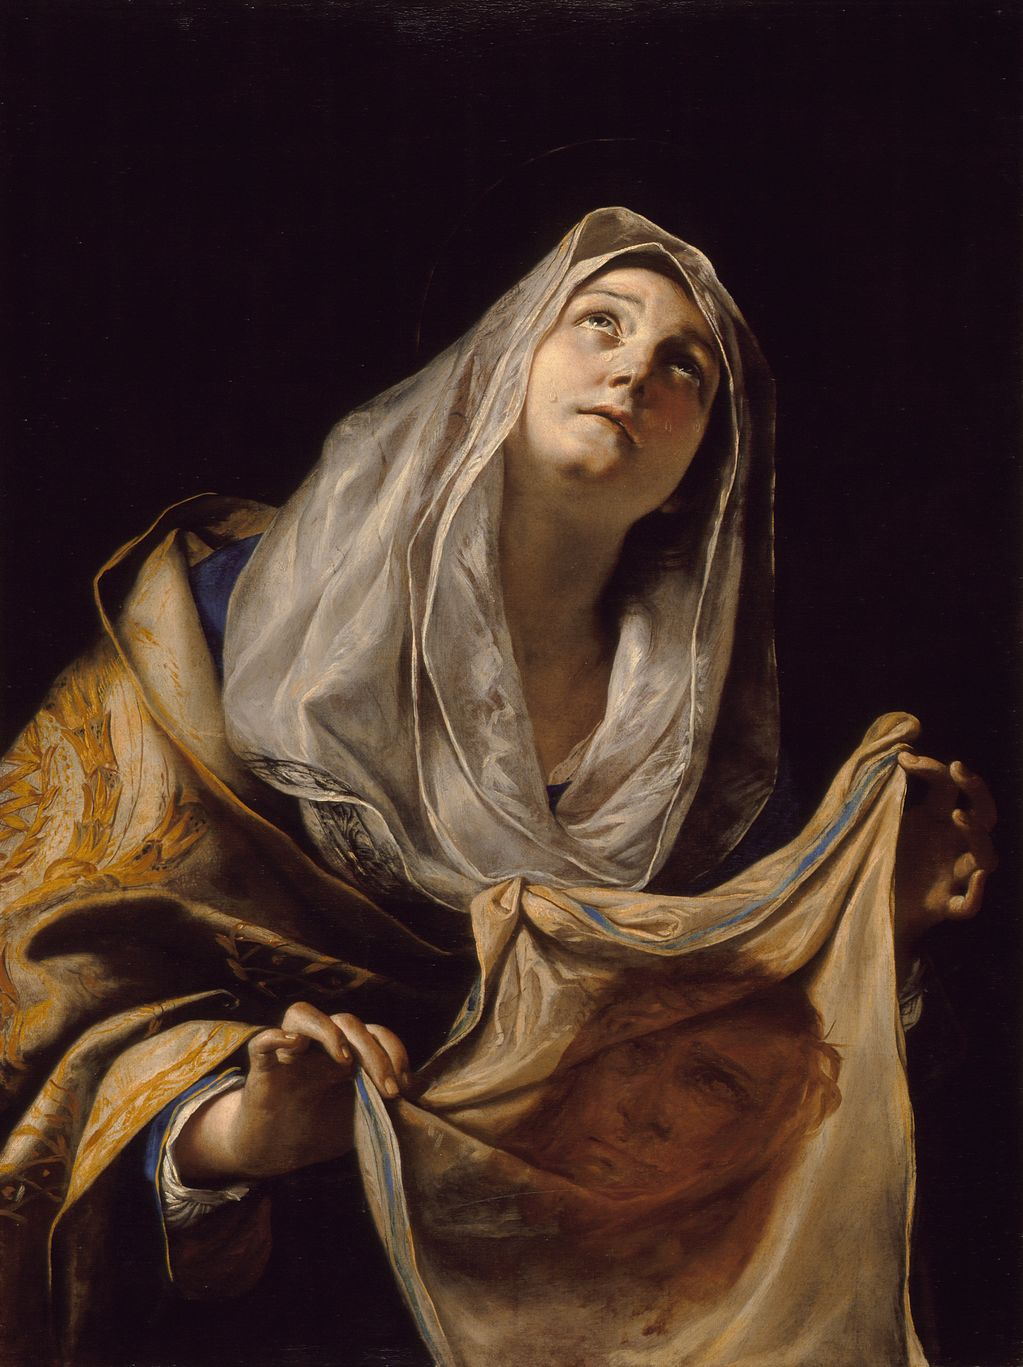 Mattia Preti (1613 – 1699) Saint Veronica with the Veil